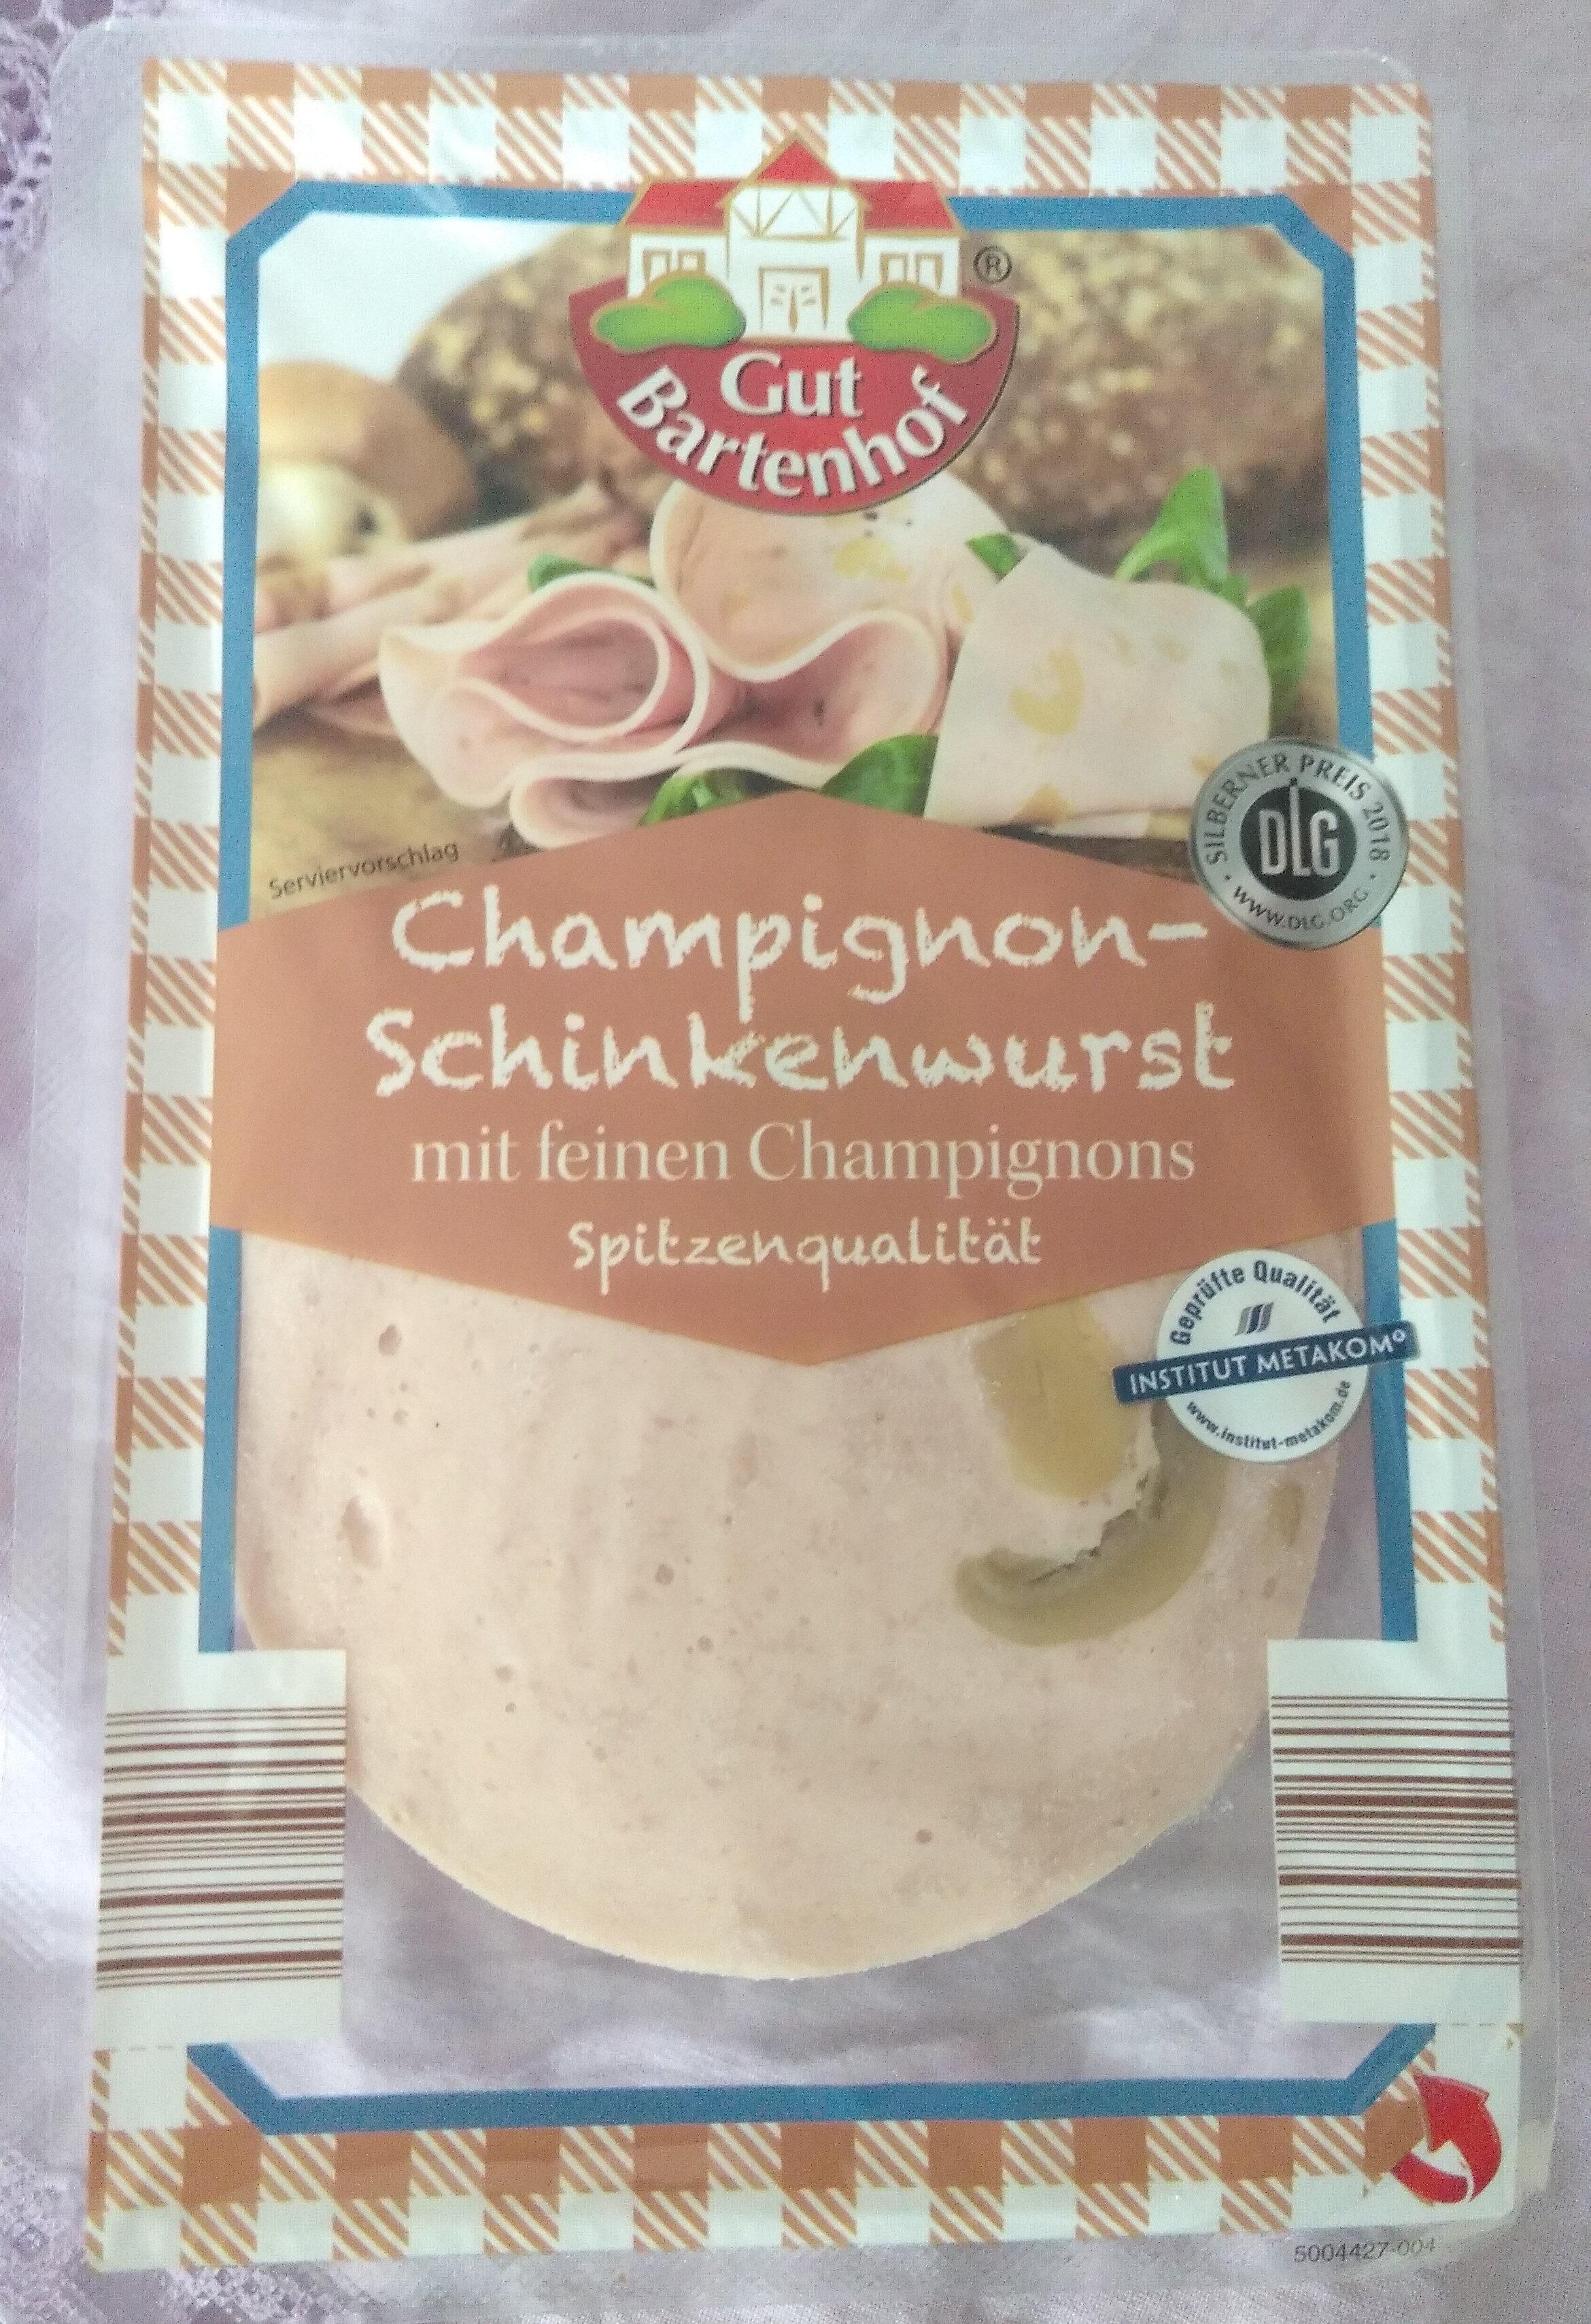 Champignon-Schinkenwurst - Product